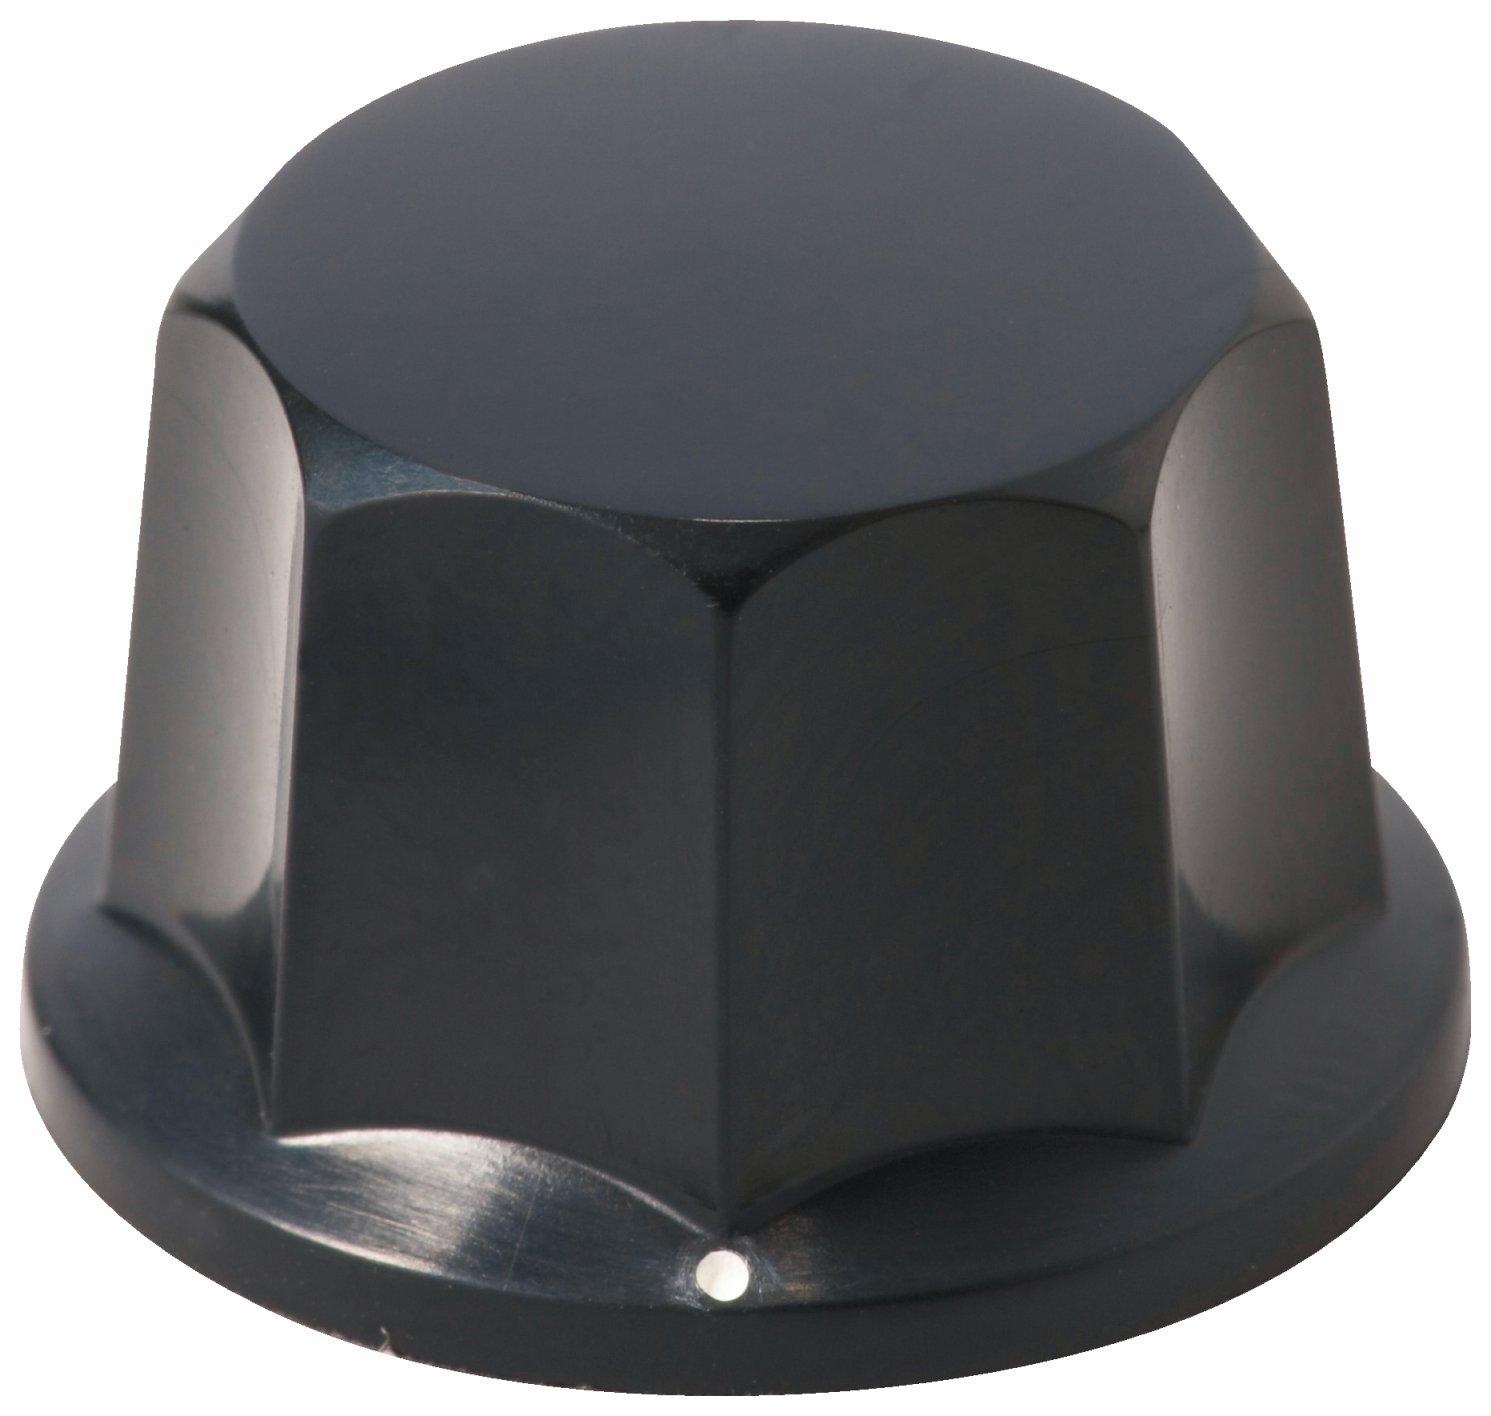 Framus Vintage Parts - Potentiometer Knob Set - Black with White Marker, 2 pcs.